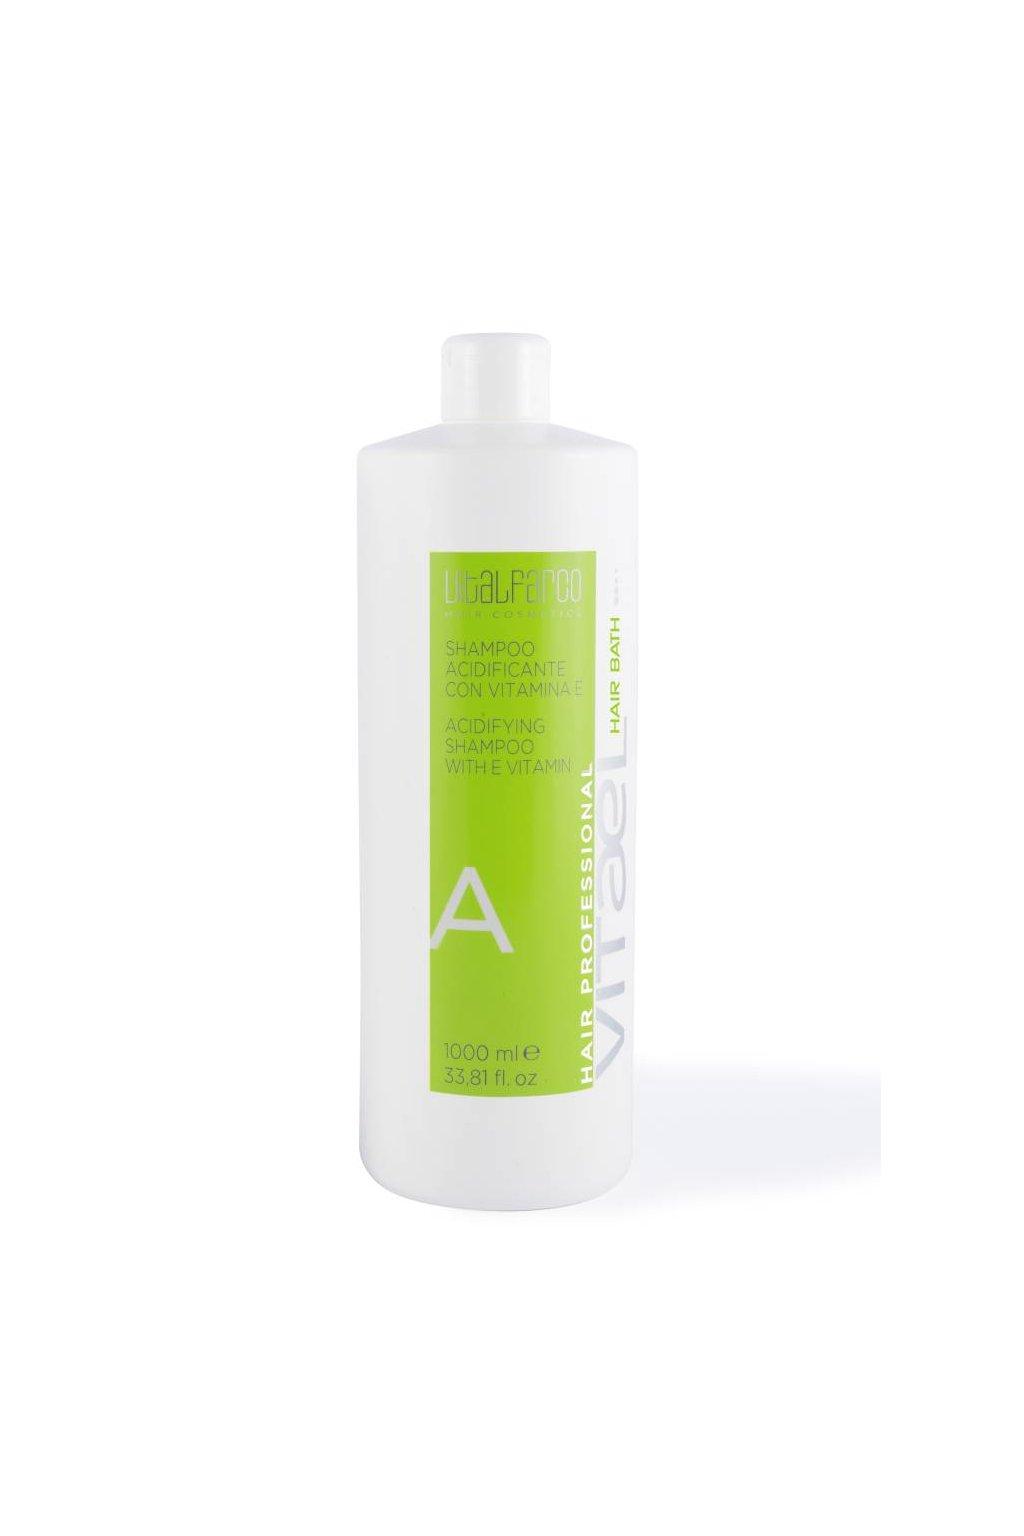 10985 vitael acid sampon a pro barvene vlasy hydratatuje a prodluzuje stalost barvy 1000ml